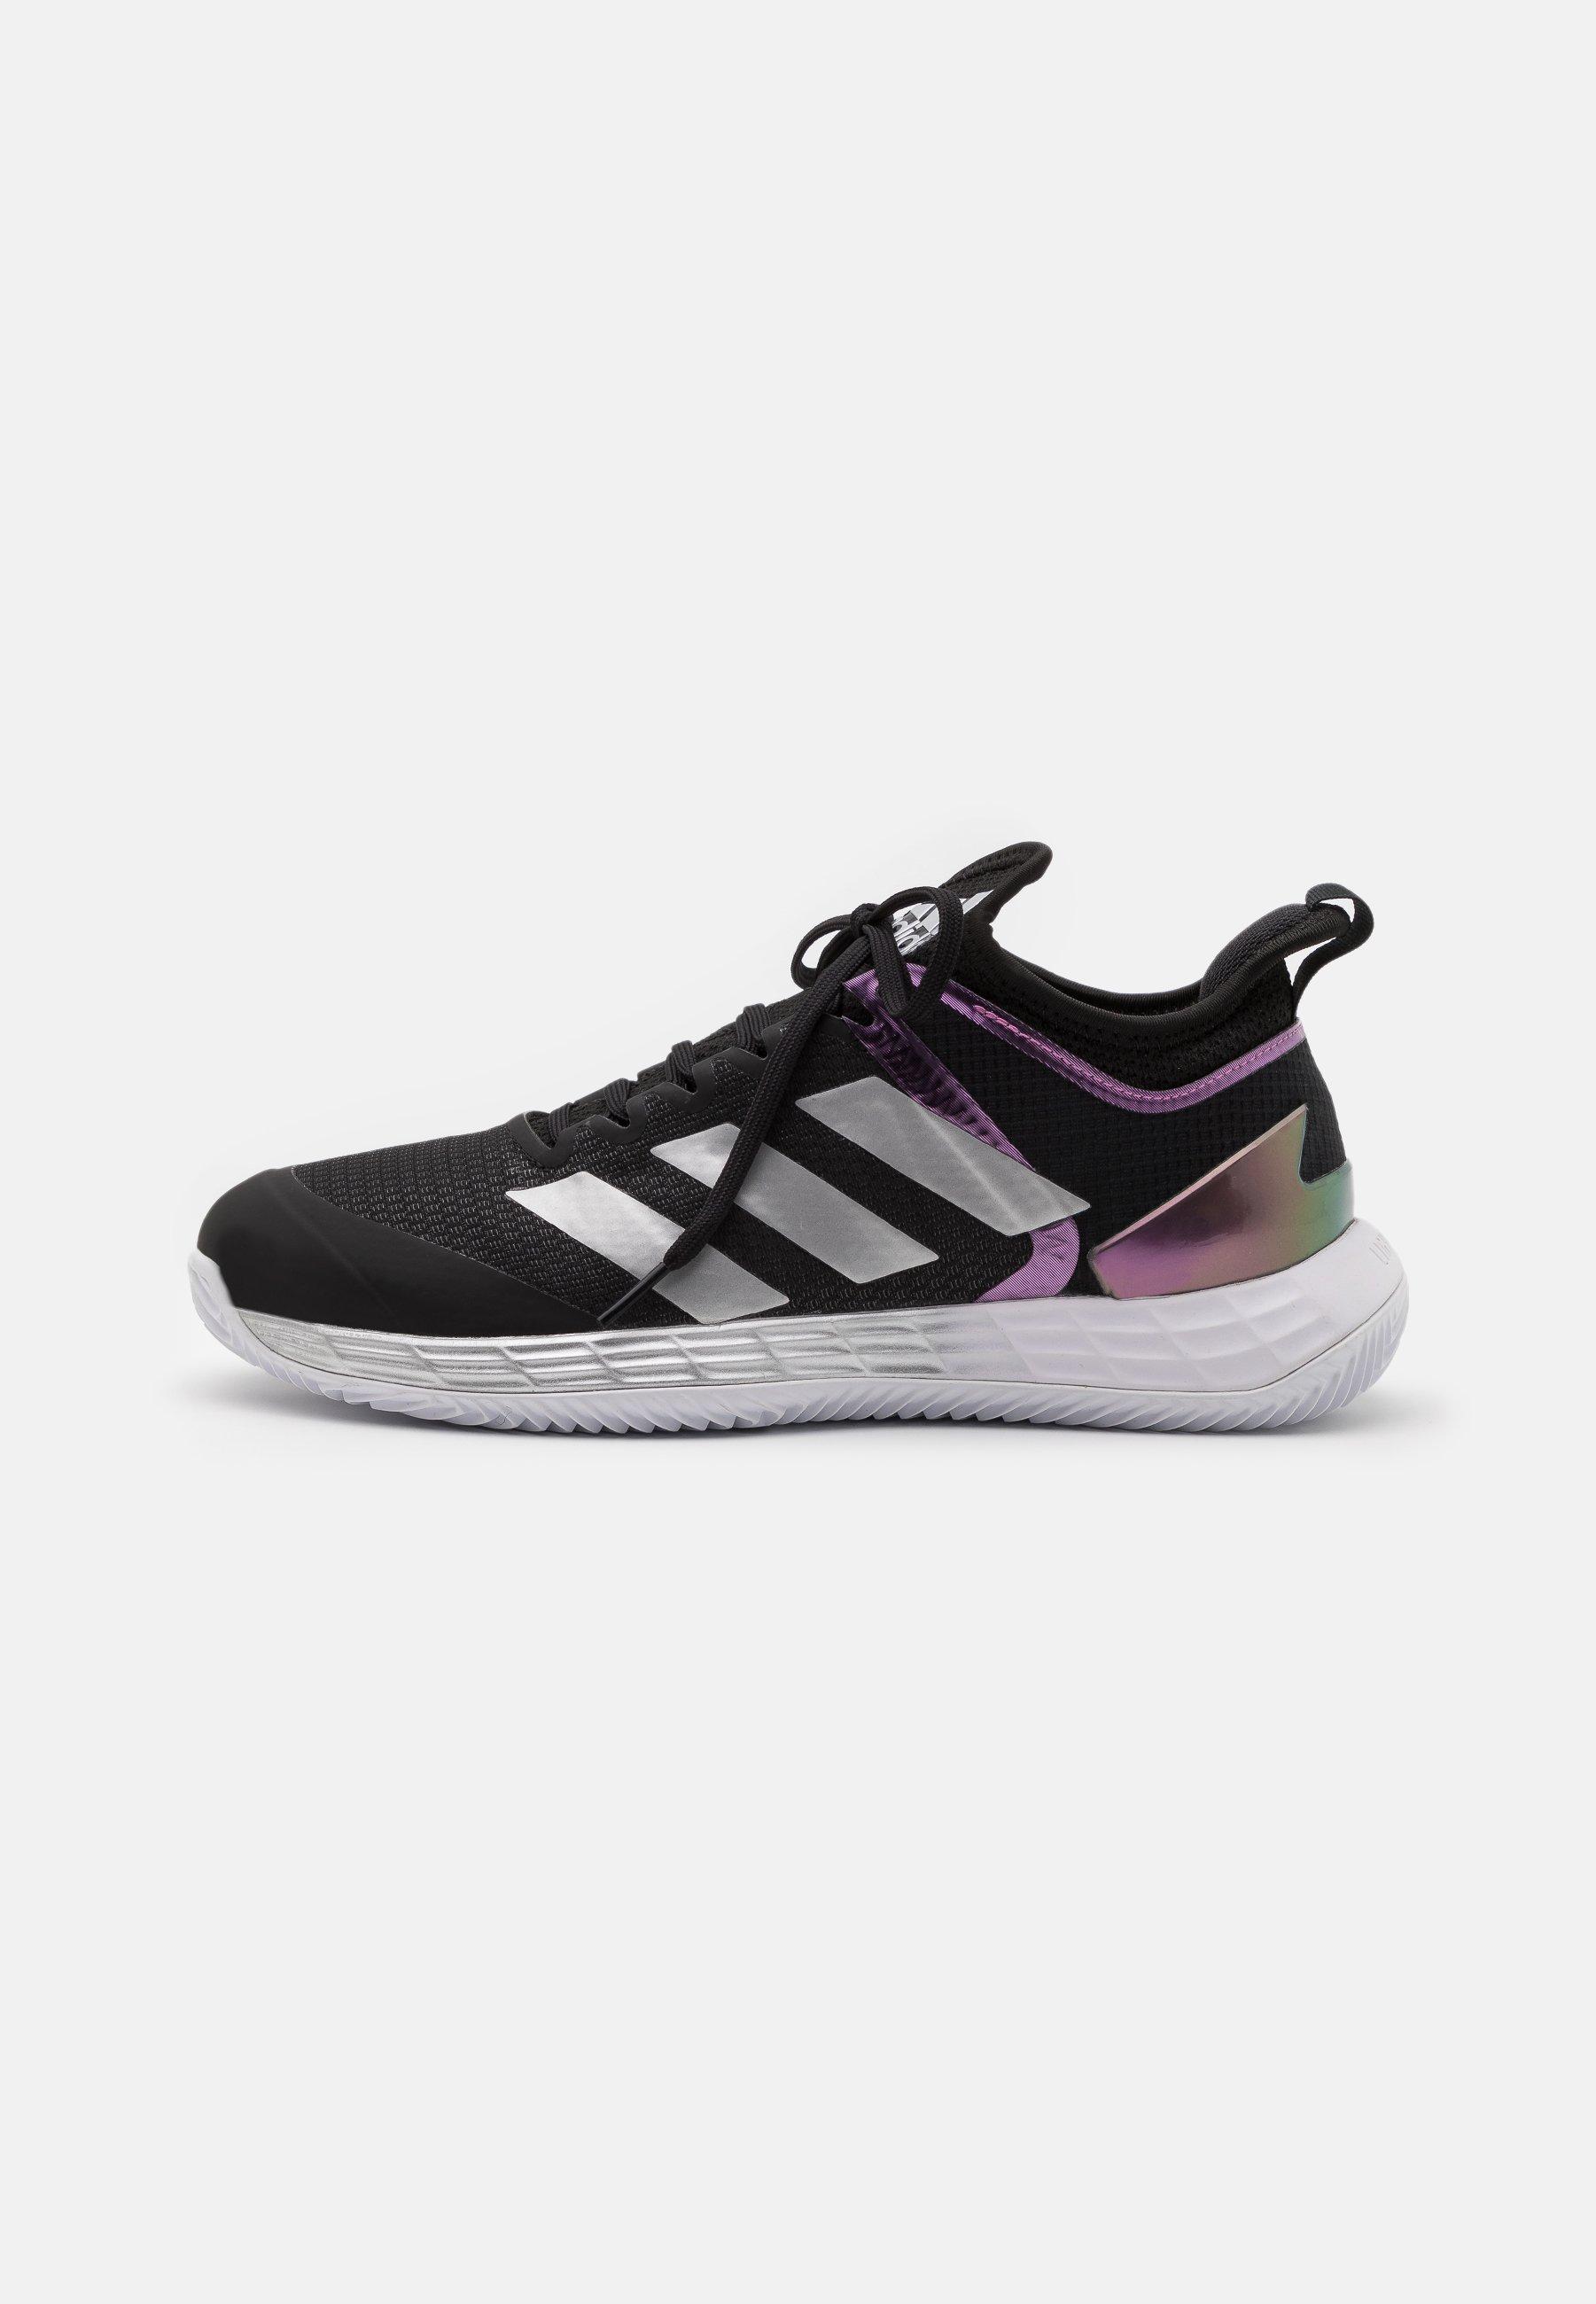 Women ADIZERO UBERSONIC 4 CLAY - Clay court tennis shoes